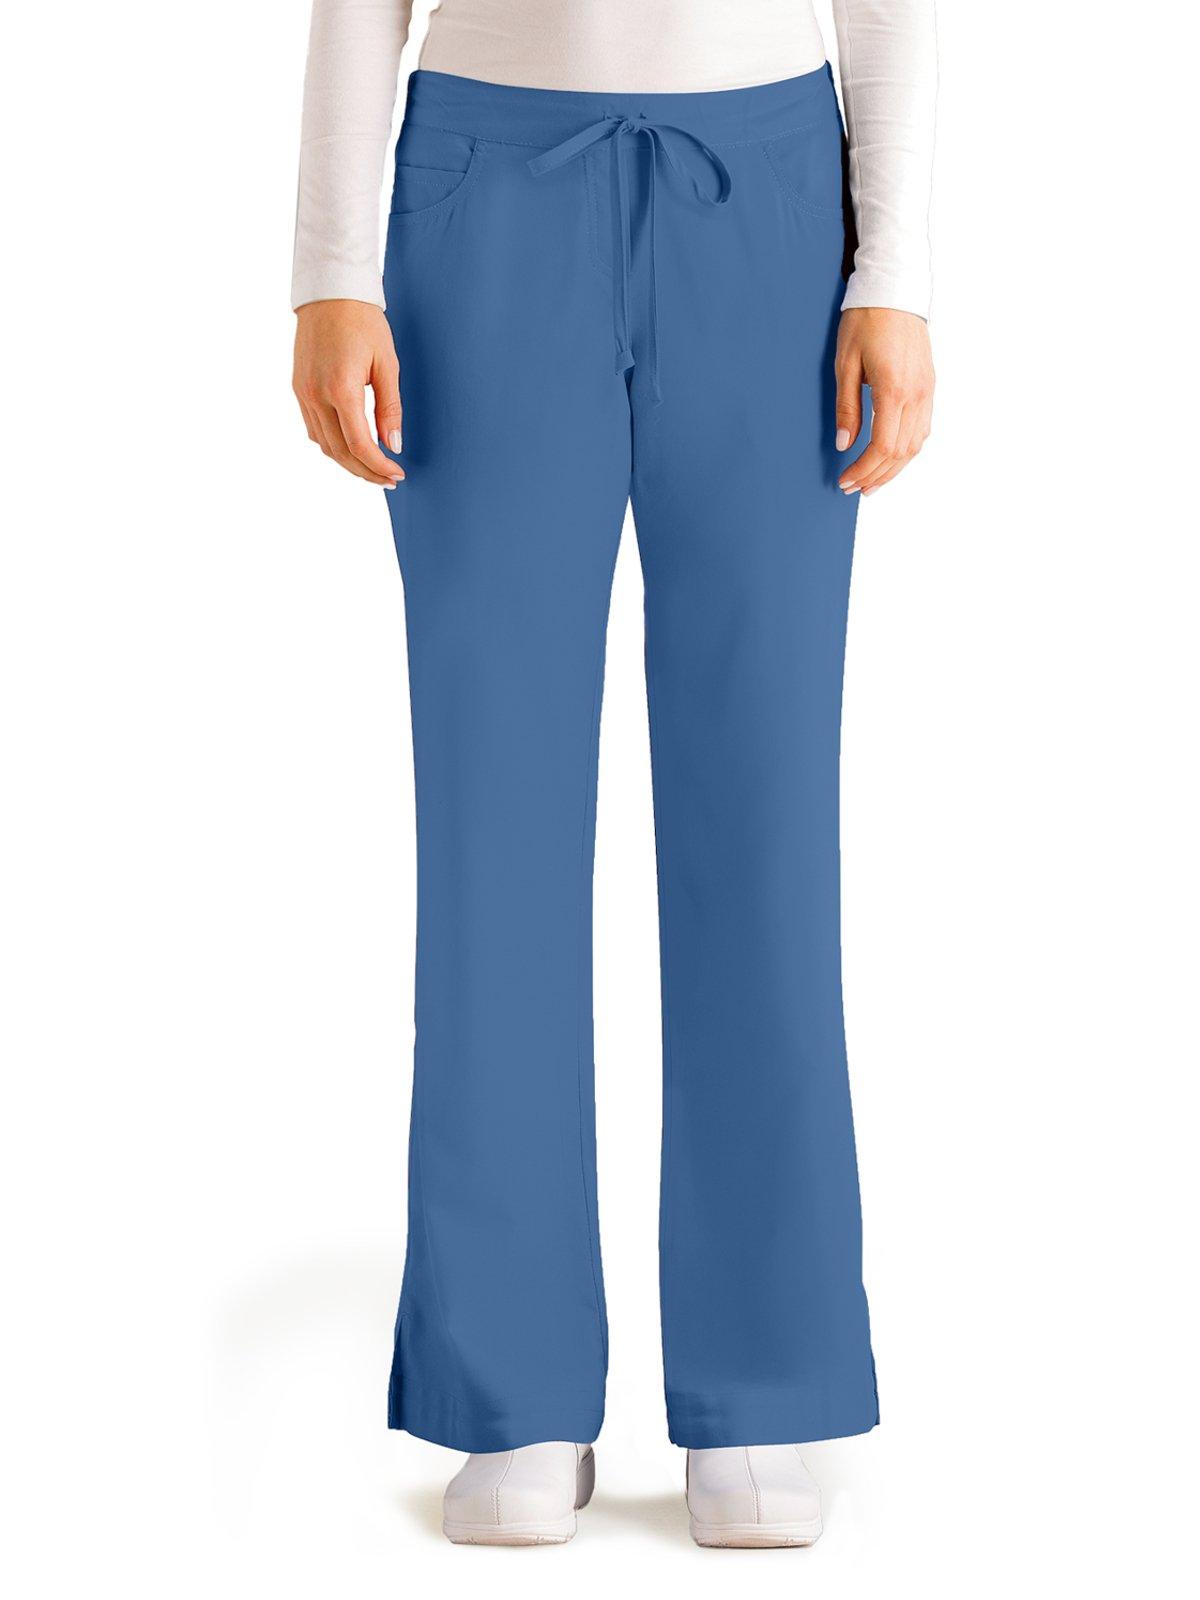 Grey's Anatomy Women's Junior-Fit Five-Pocket Drawstring Scrub Pant - XX-Small - French Blue